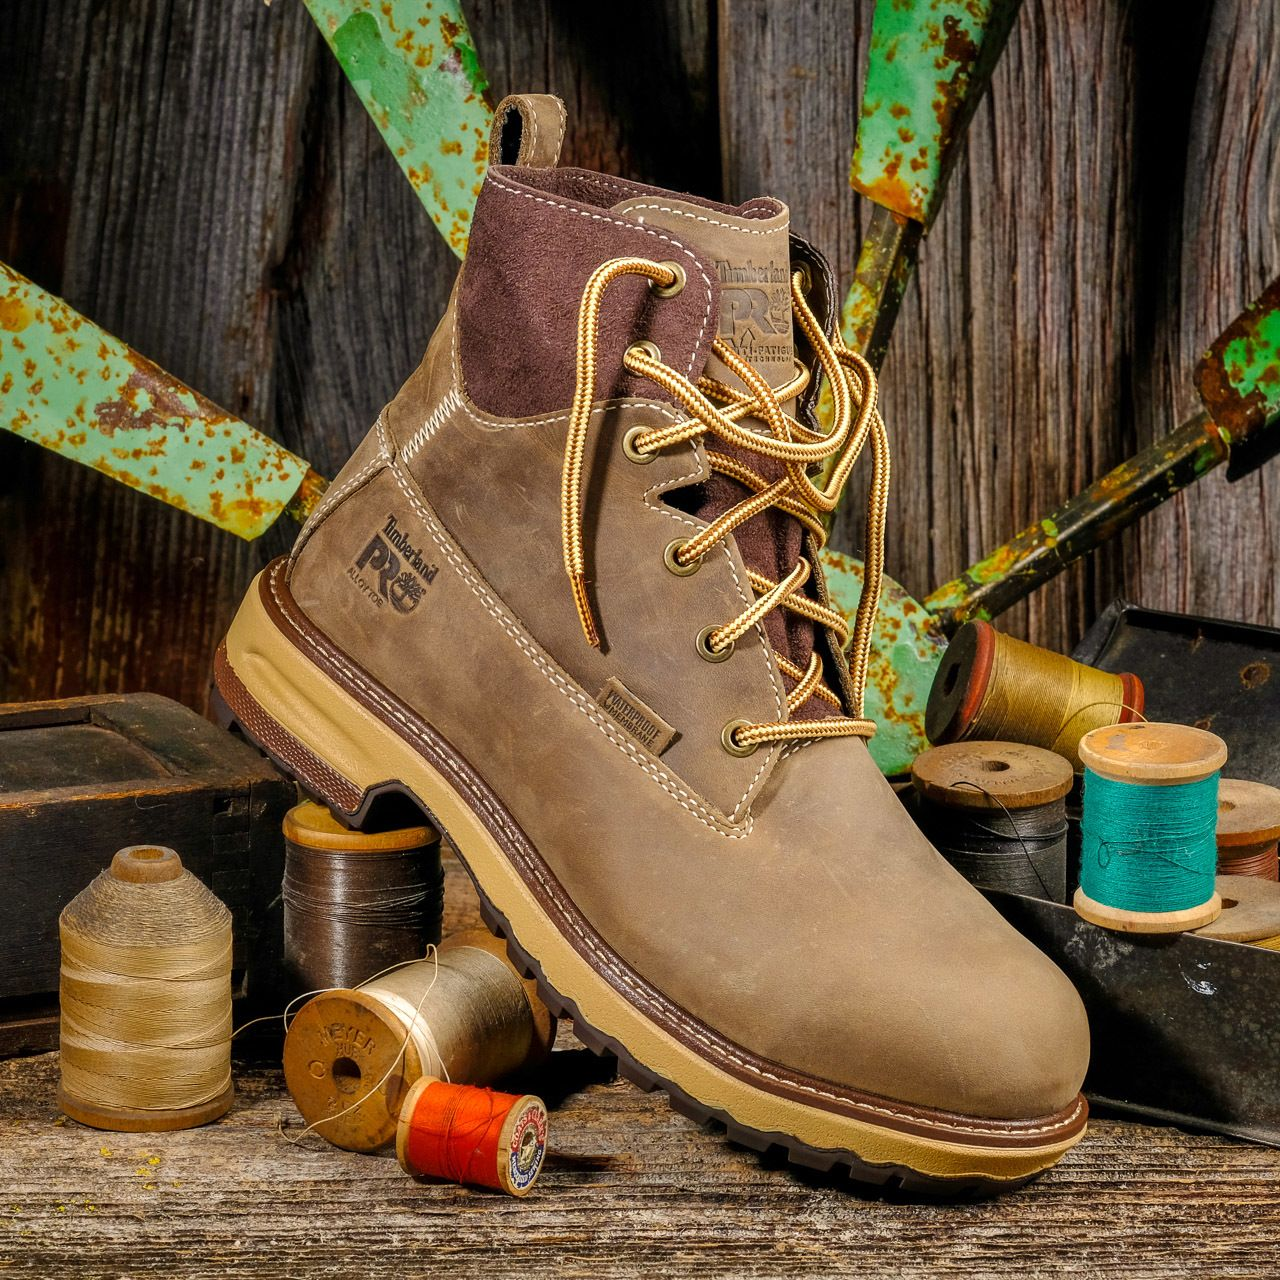 02960be10f1 Timberland PRO Women Alloy WP Hightower Boots | Women's Work | Boots ...